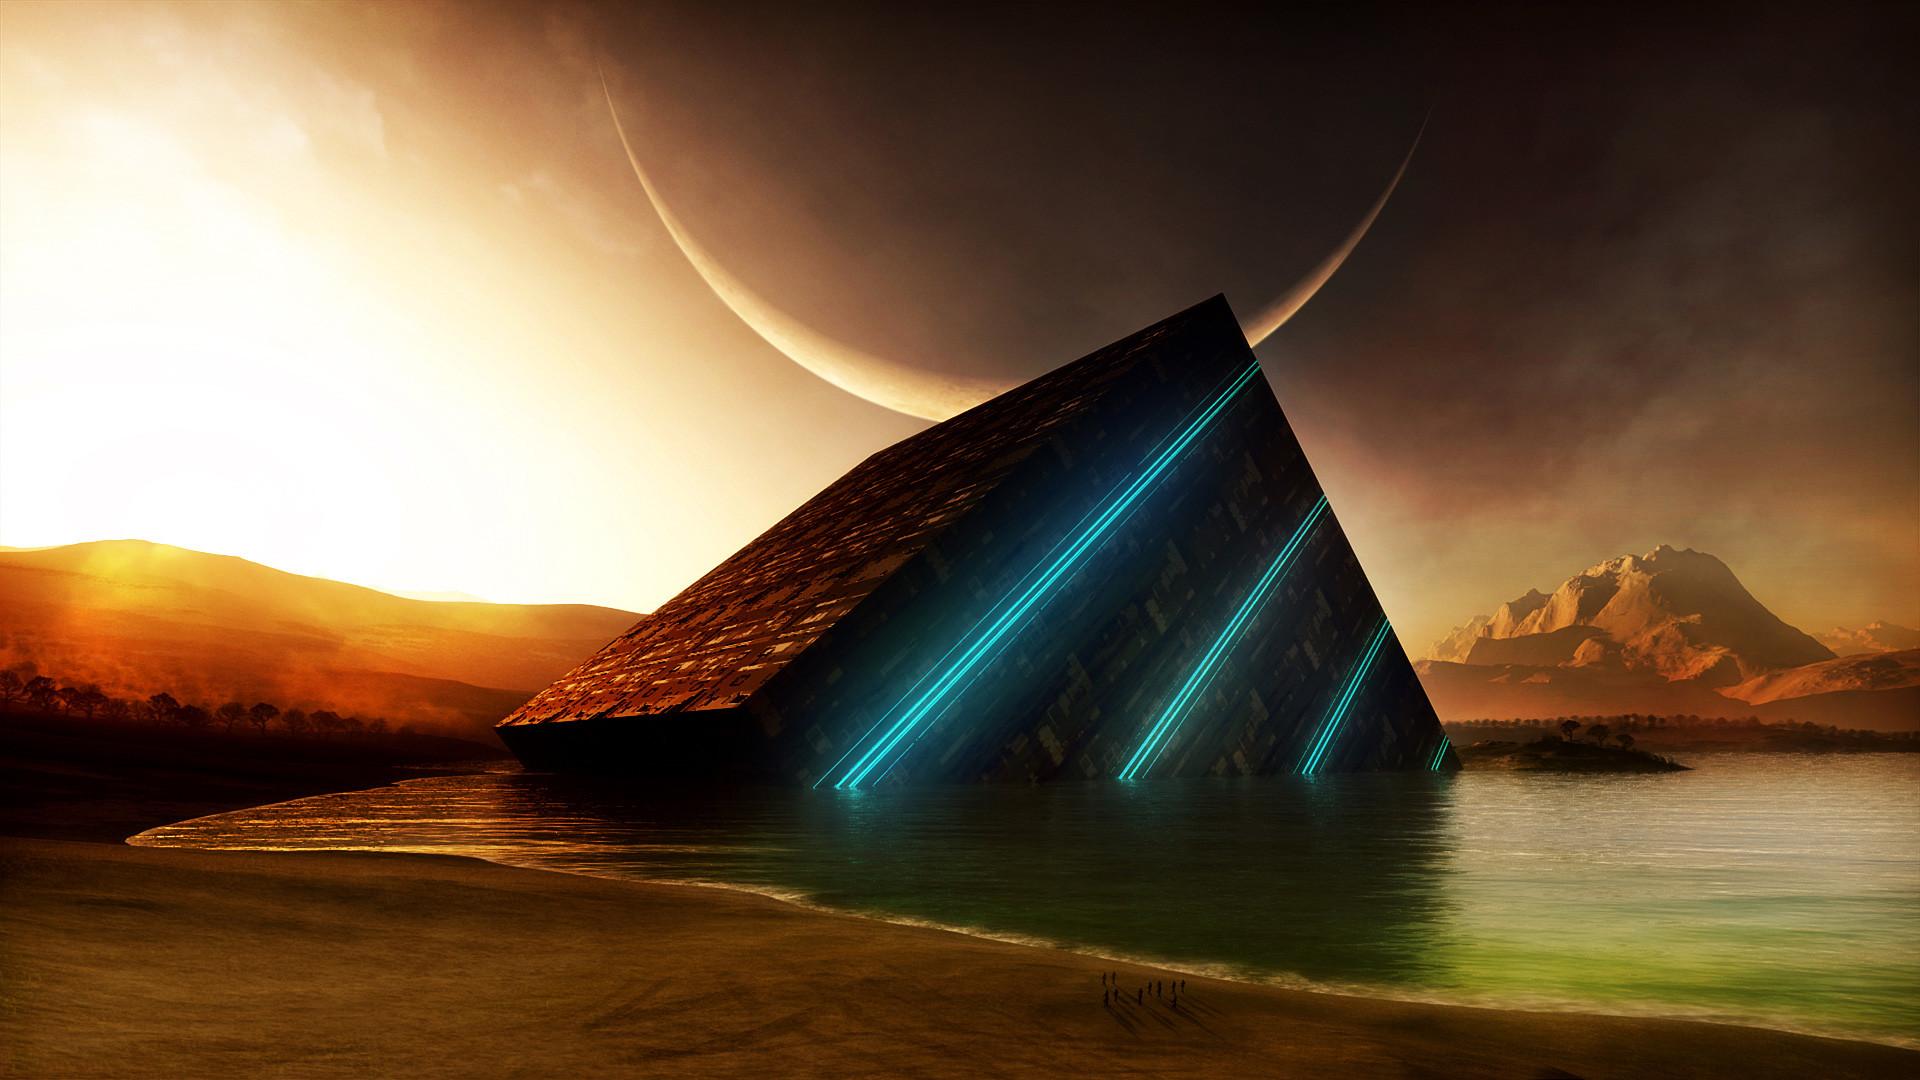 1920x1080 Sci Fi Landscape Wallpaper Desktop Background Tdj